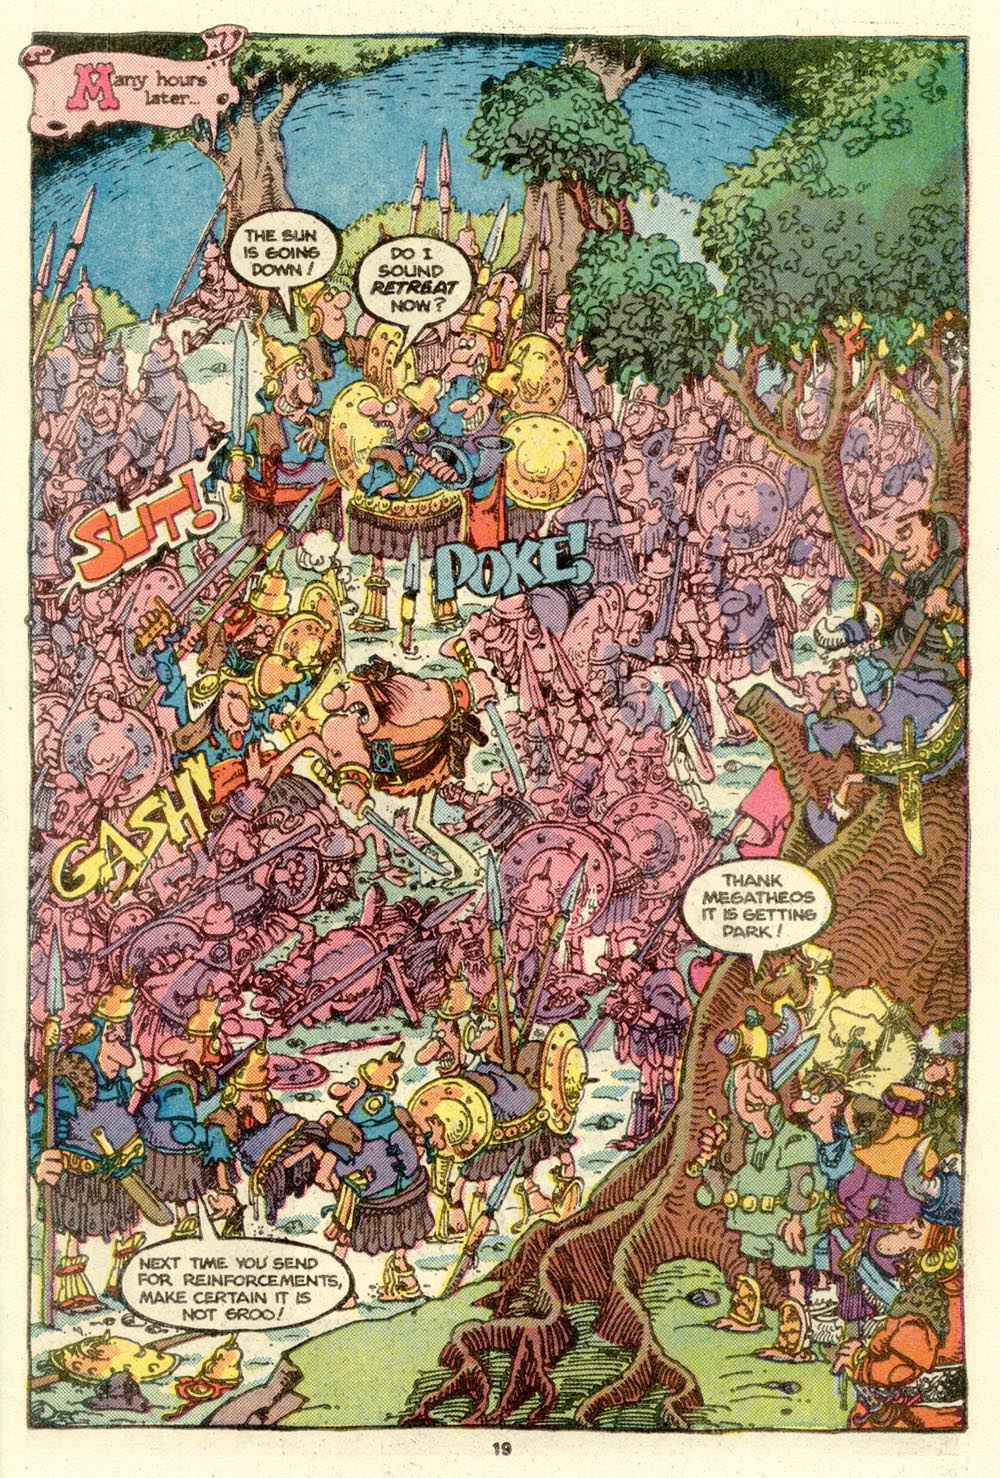 Read online Sergio Aragonés Groo the Wanderer comic -  Issue #16 - 19